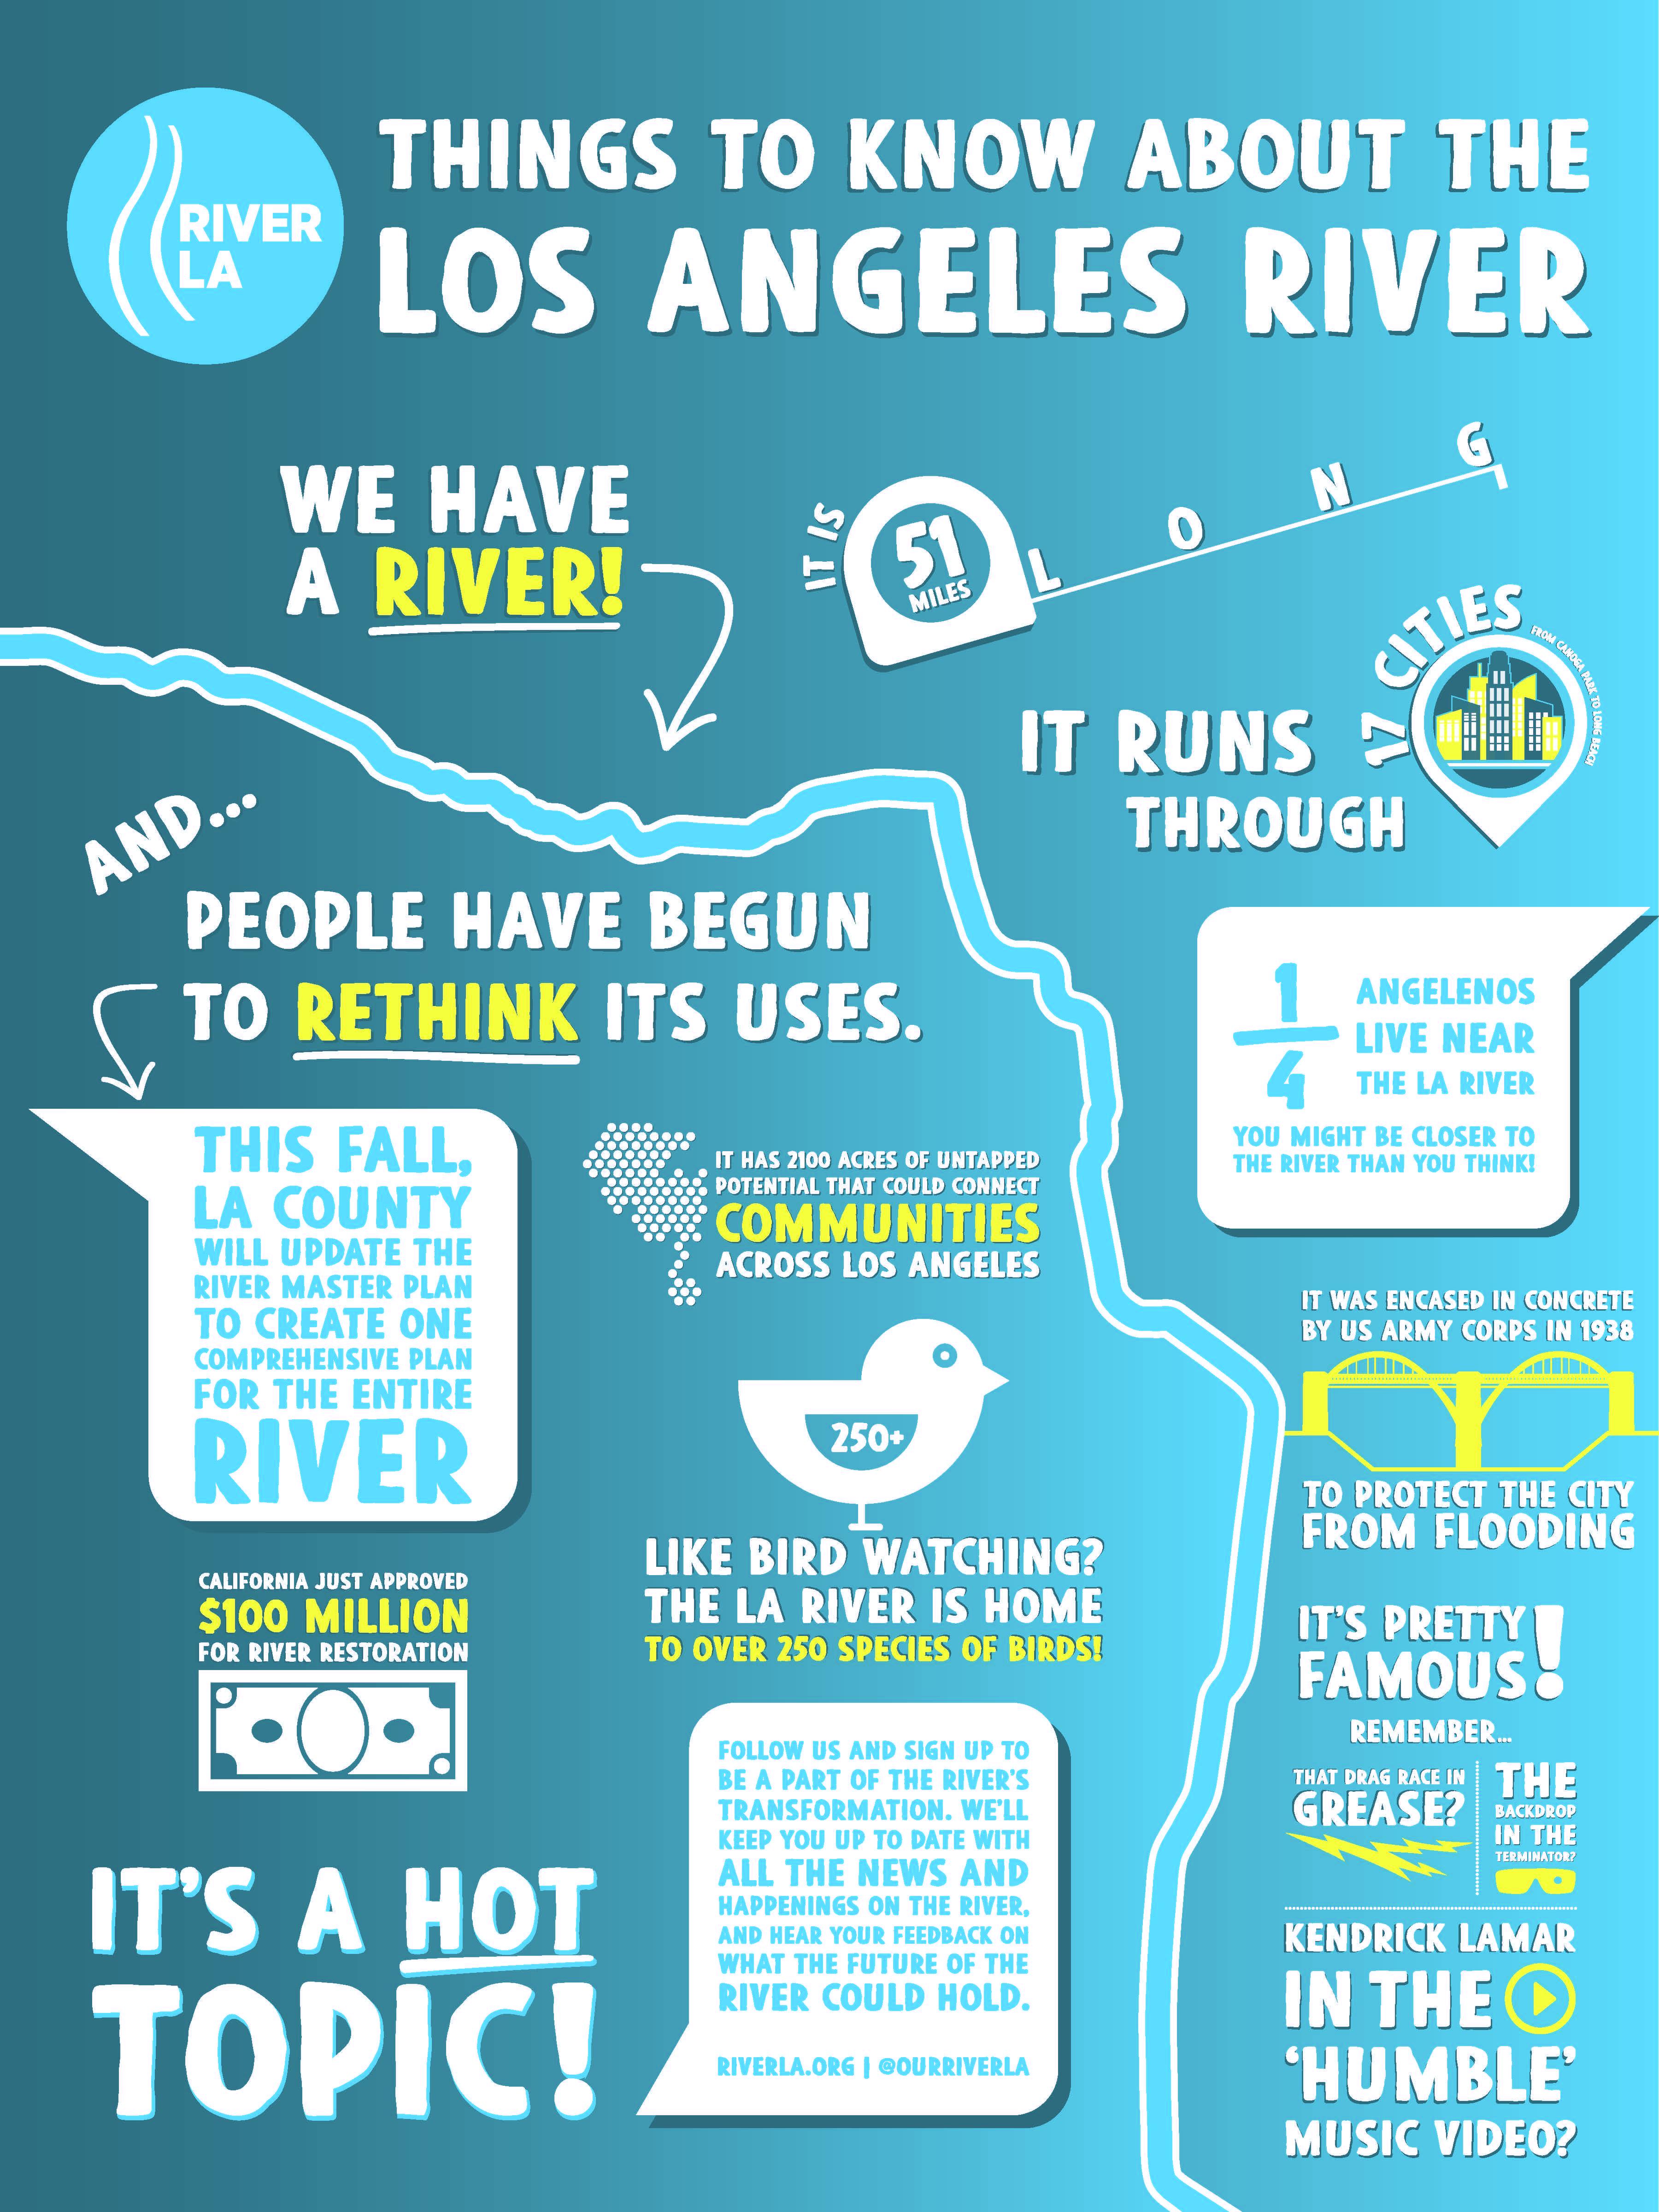 LA_River_Infographic_FINAL.jpg